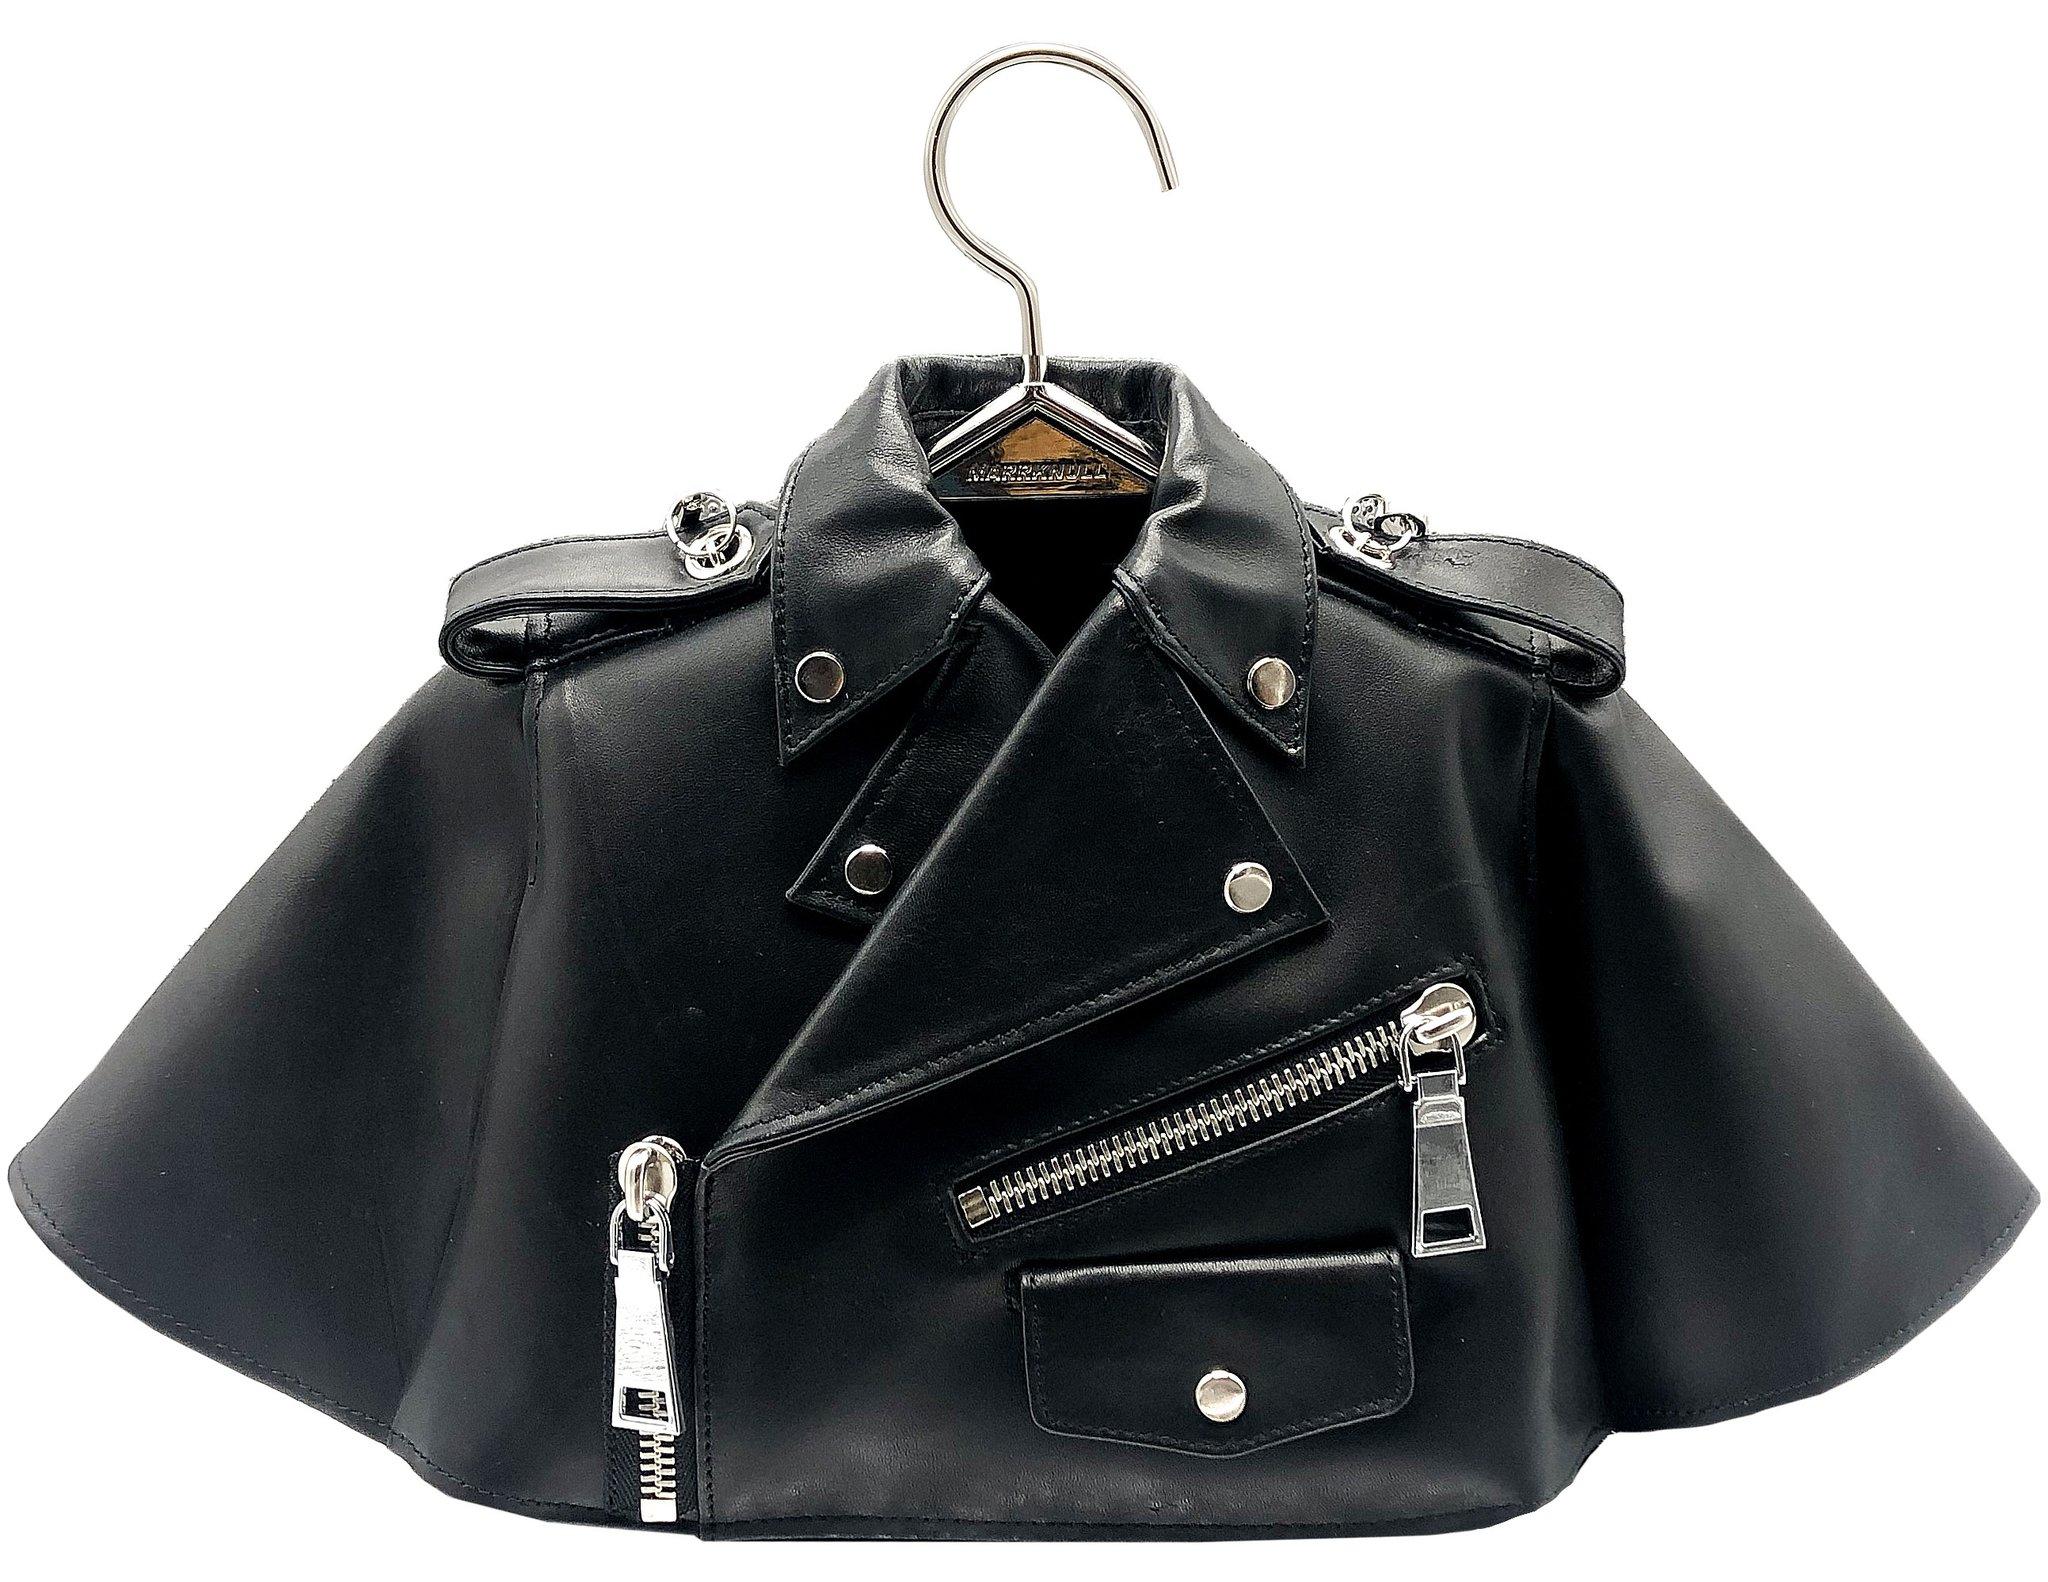 Marrknull hanger jacket bag